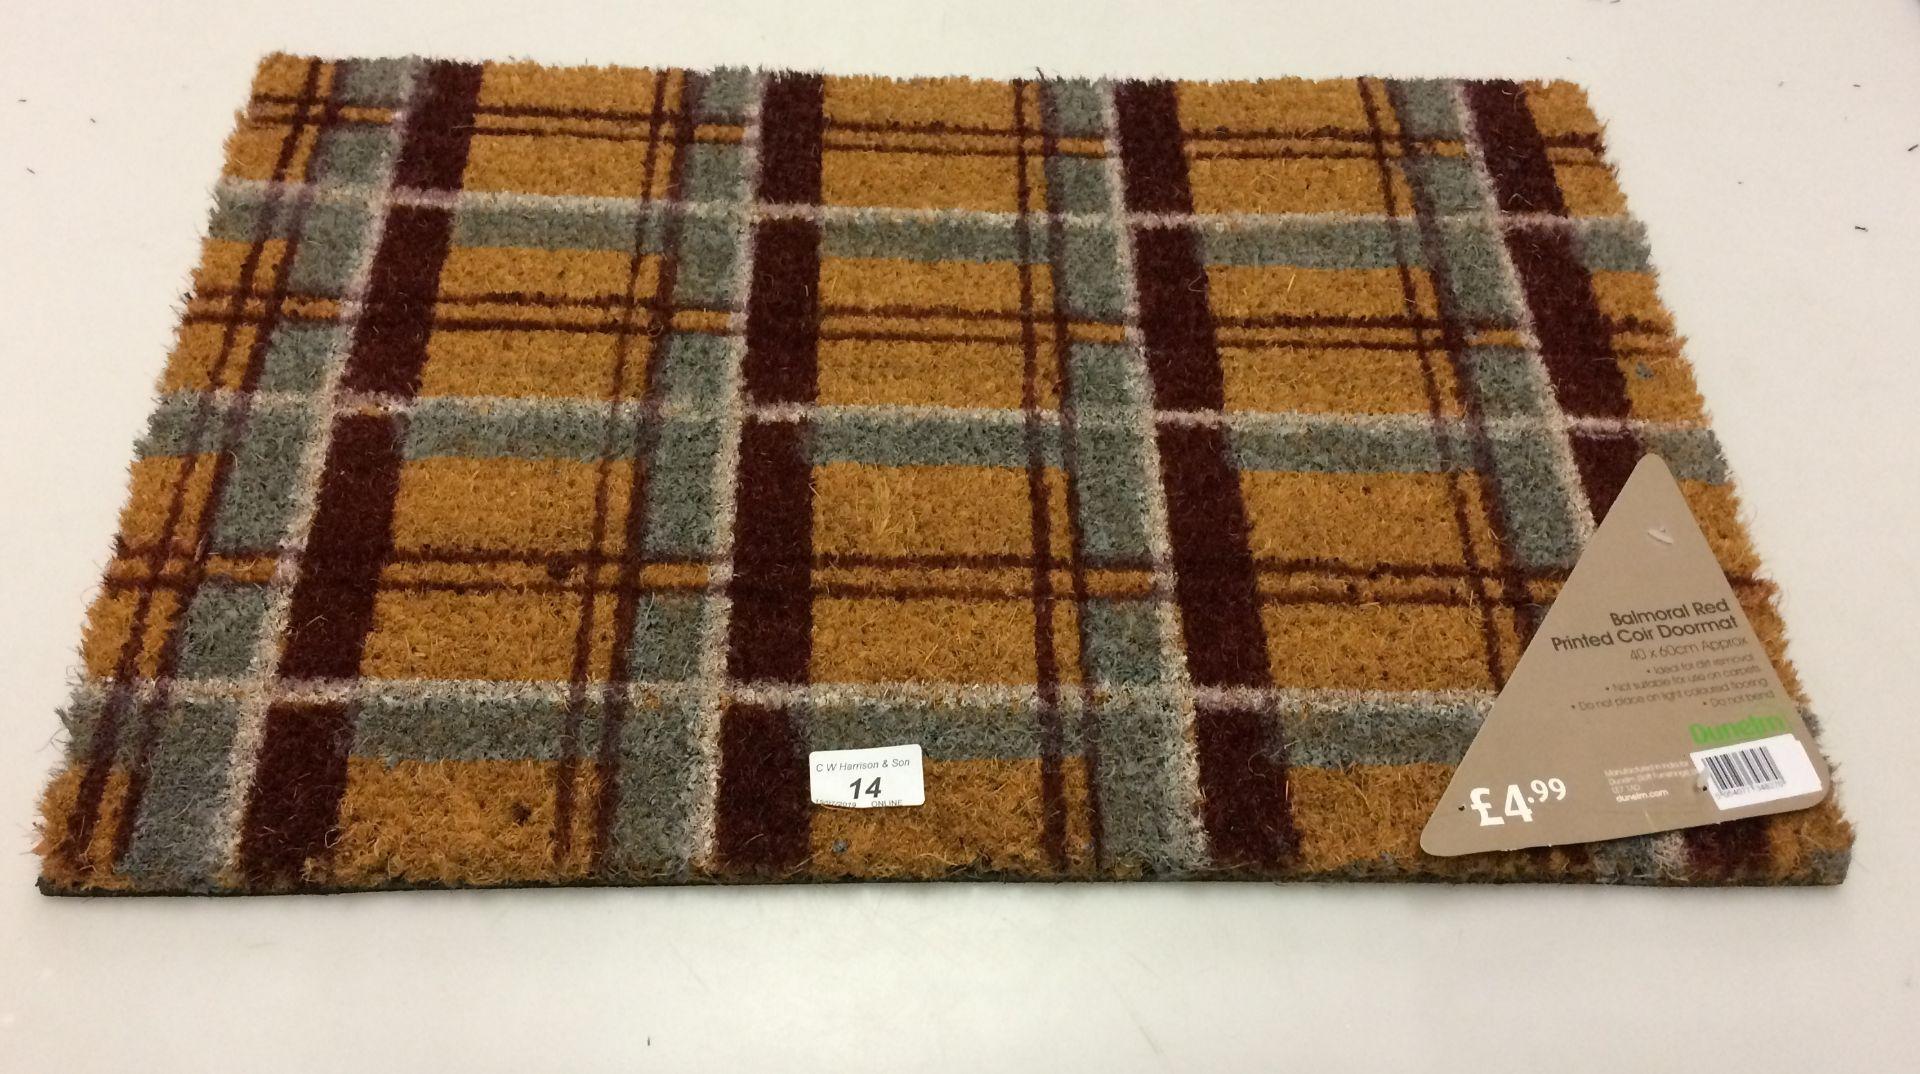 Lot 14 - 20 x Dunelm Balmoral red printed coir door mats 40 x 60cm